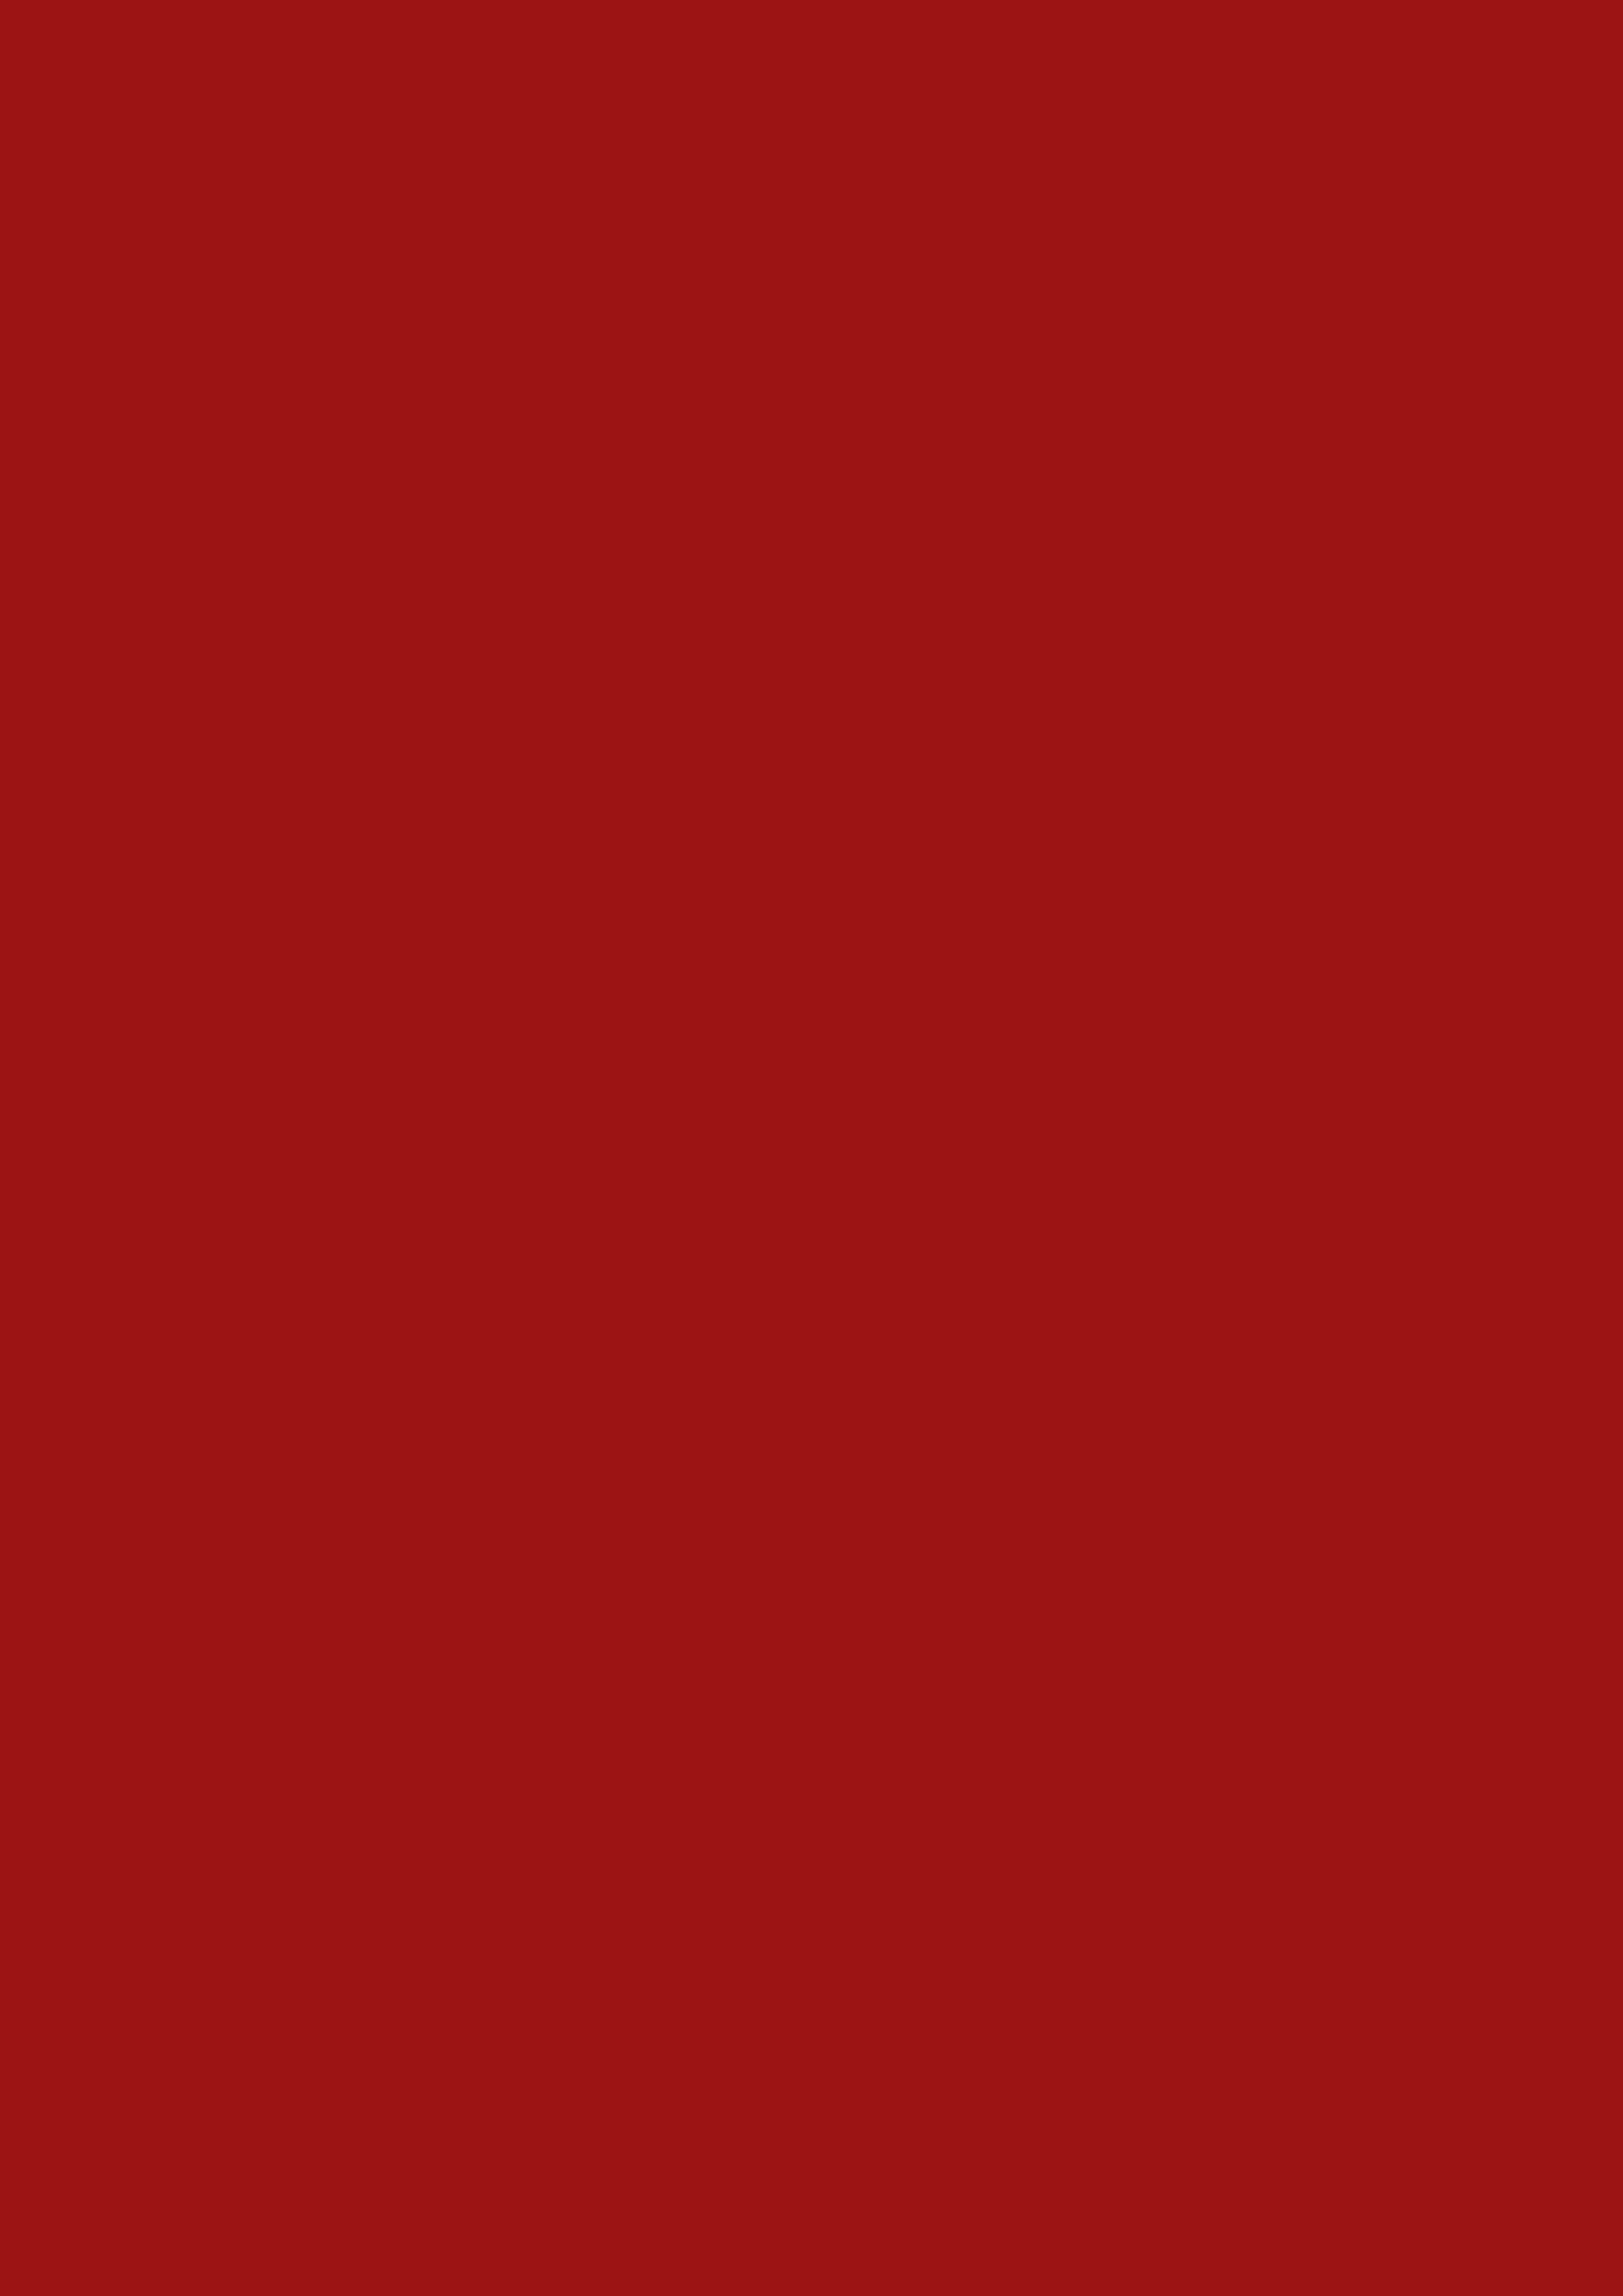 2480x3508 Spartan Crimson Solid Color Background